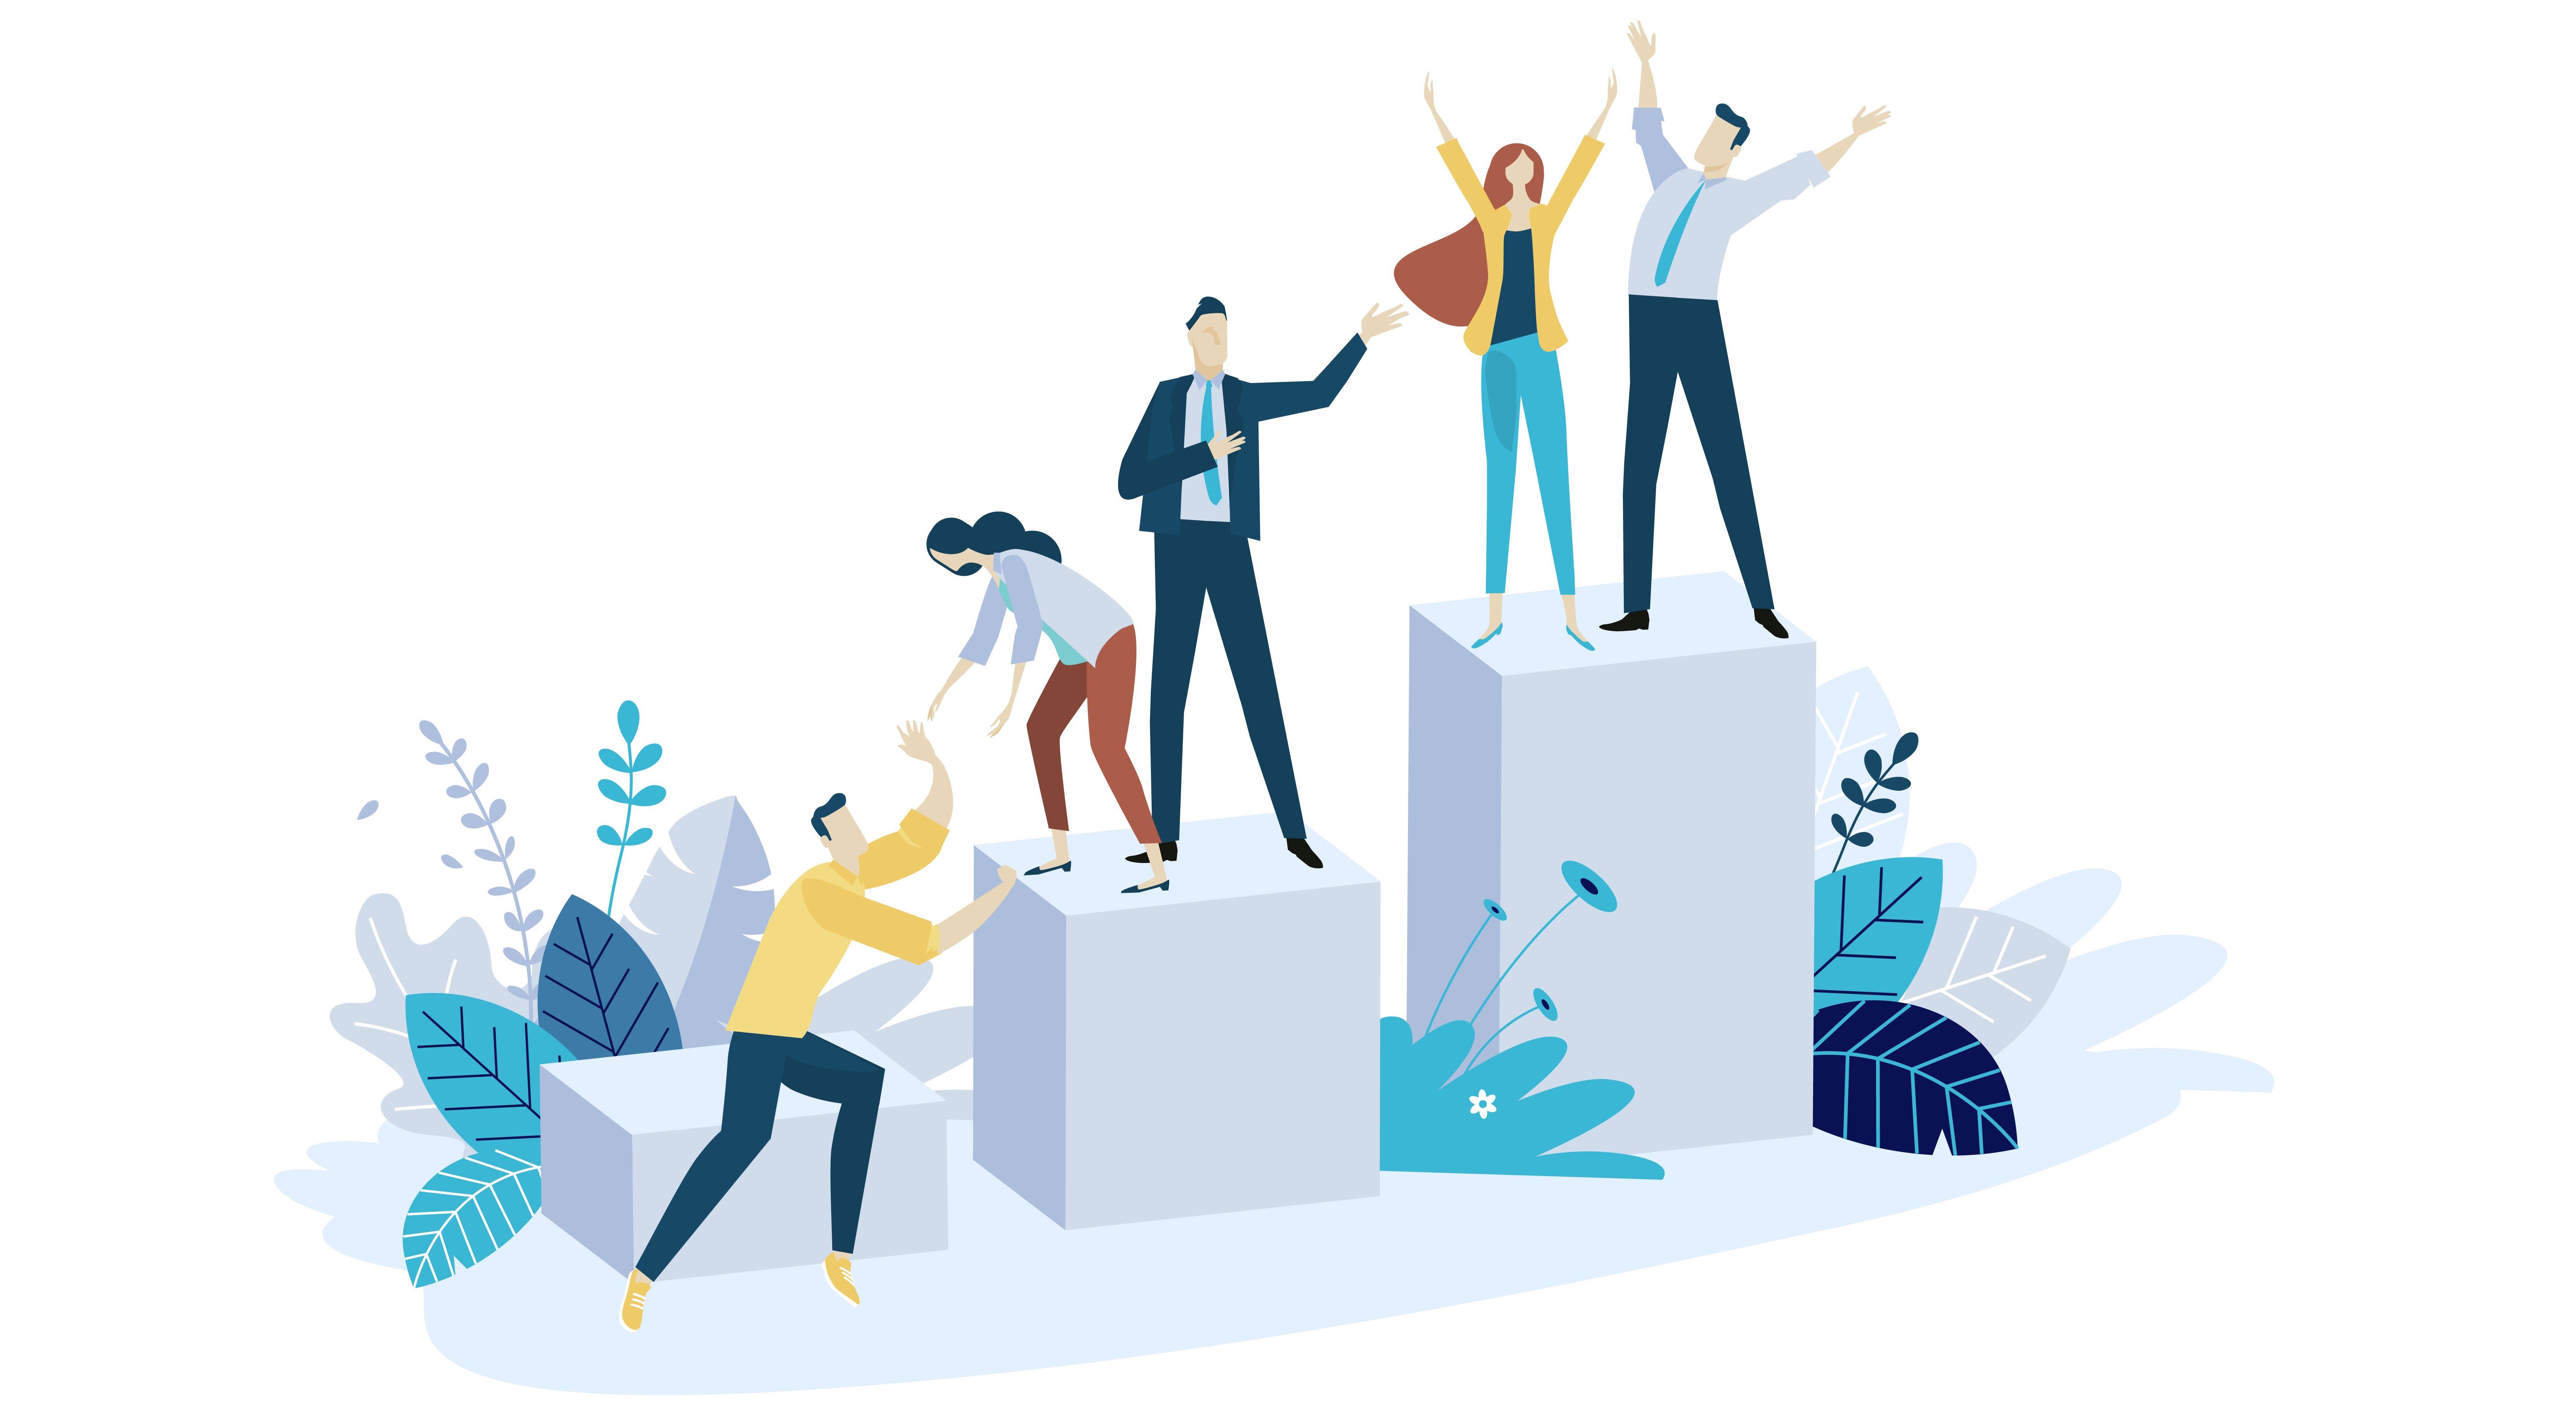 Marketing Growth Ilustration